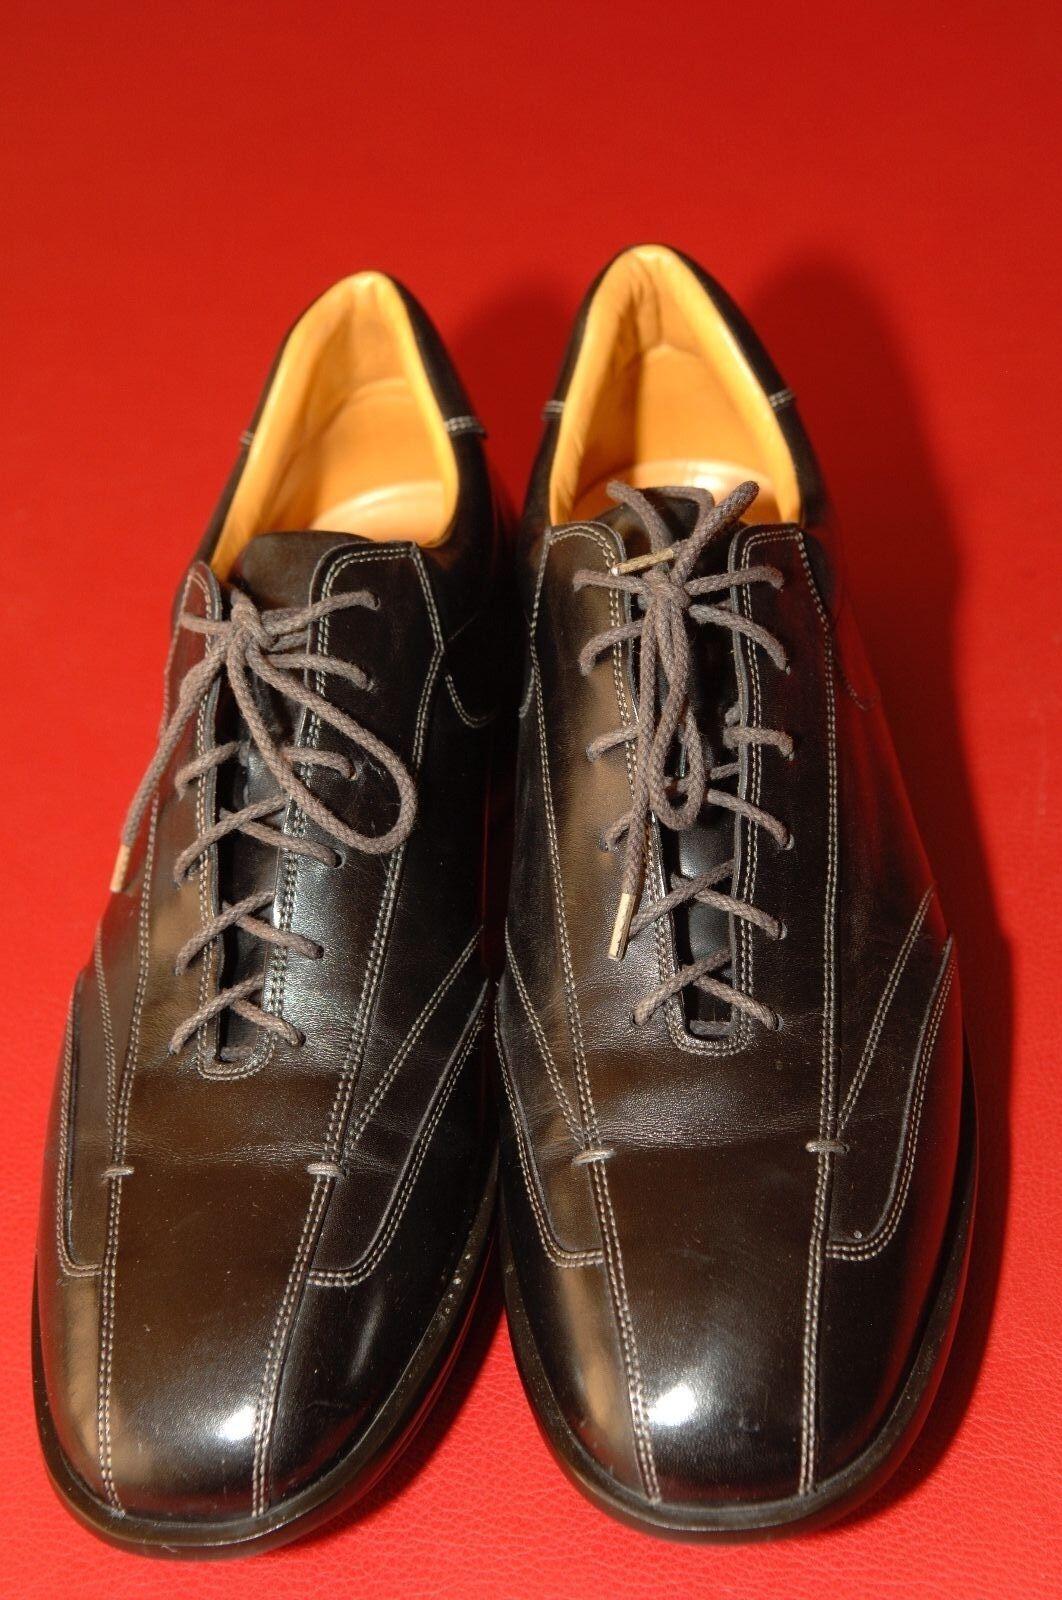 Santoni Club Men's nero Leather Driving Lace-Up scarpe, Dimensione 9 1 2 D, Mint